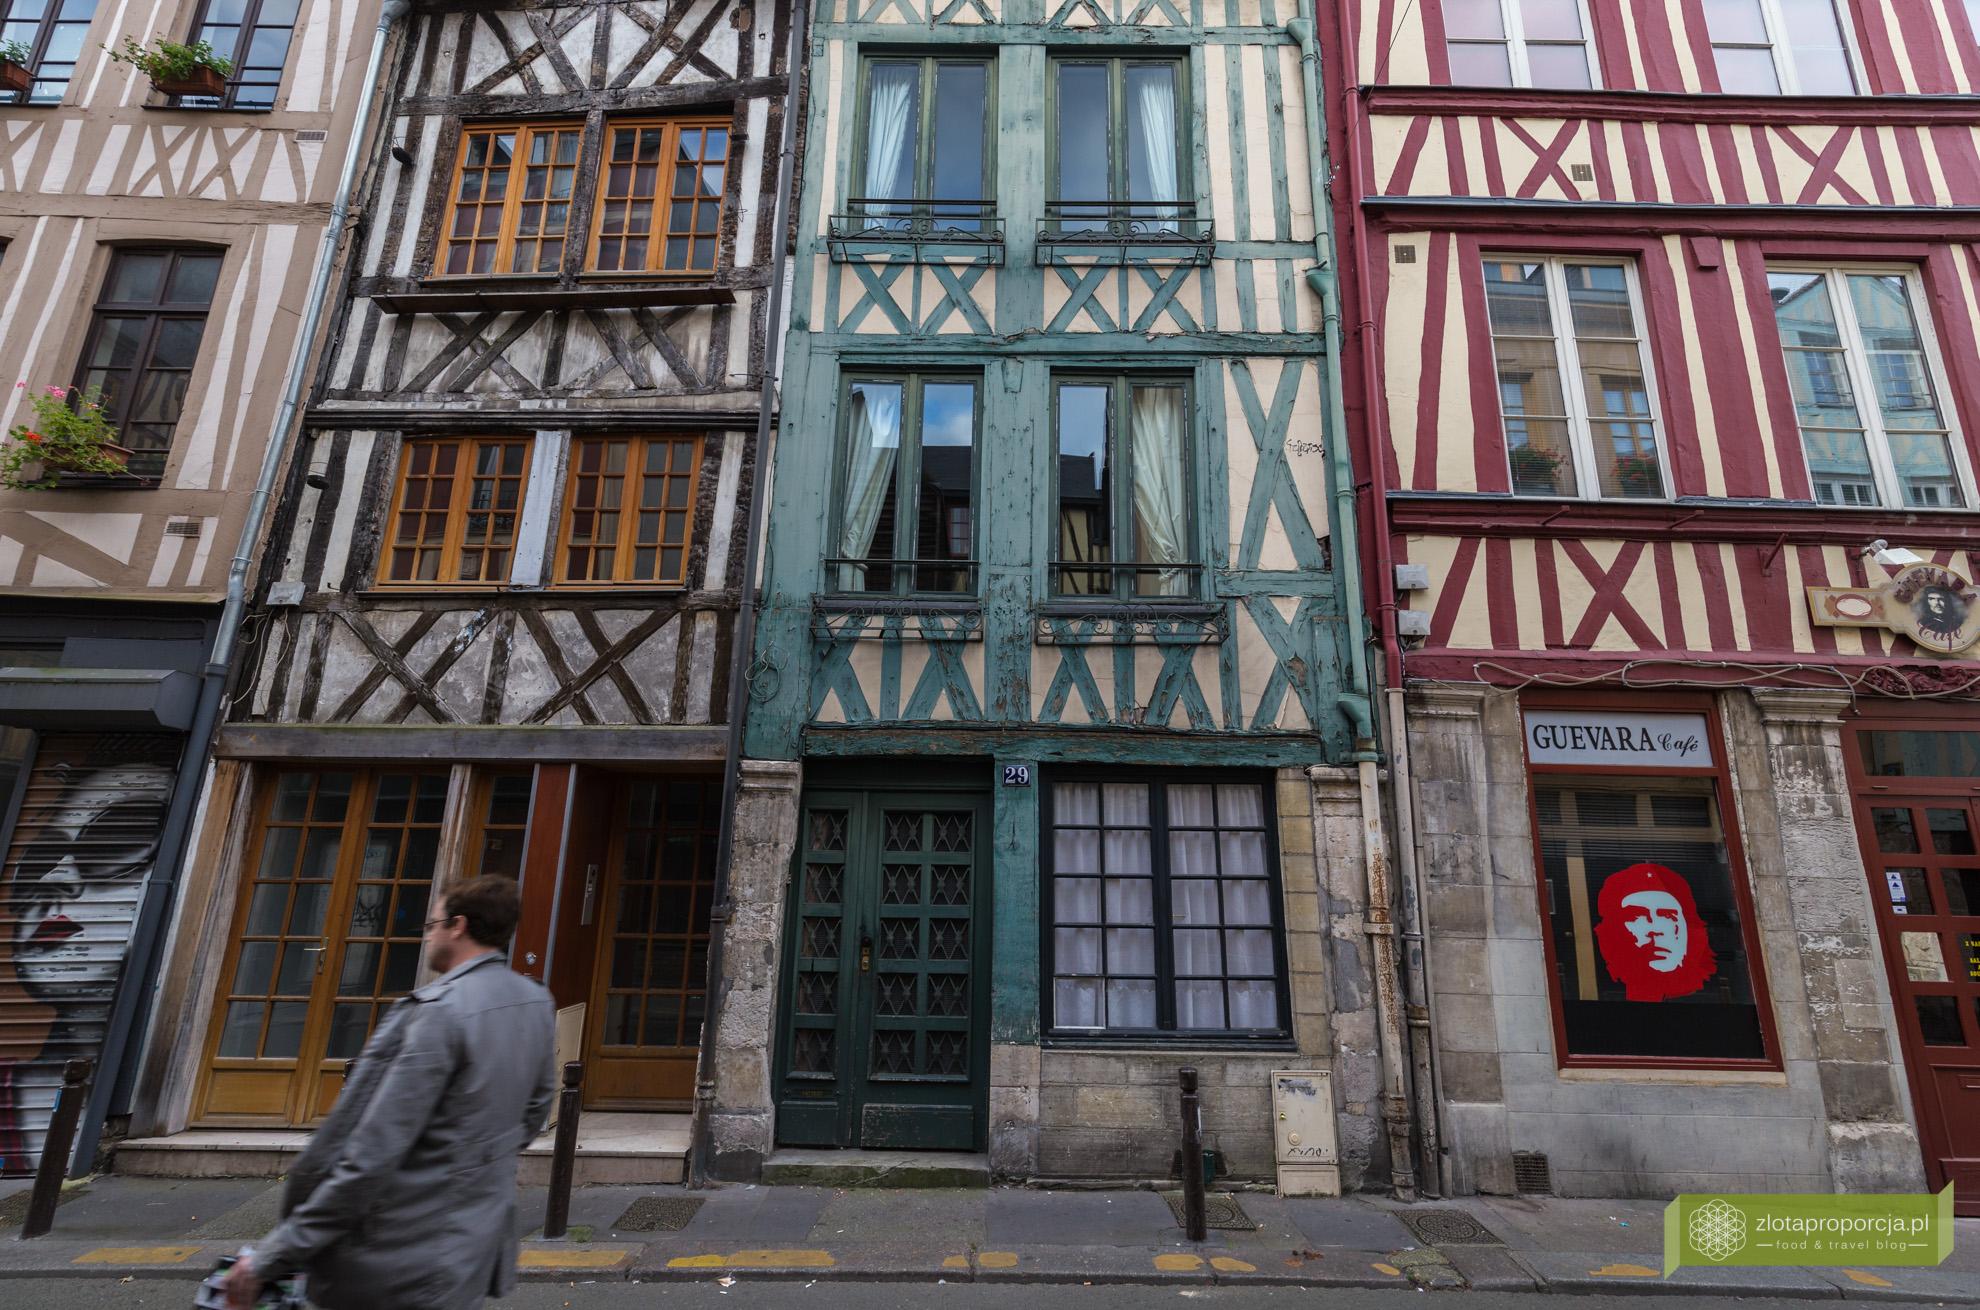 Rouen,vNormandia, atrakcje Rouen, atrakcje Normandii, zabytkowe kamienice w Rouen